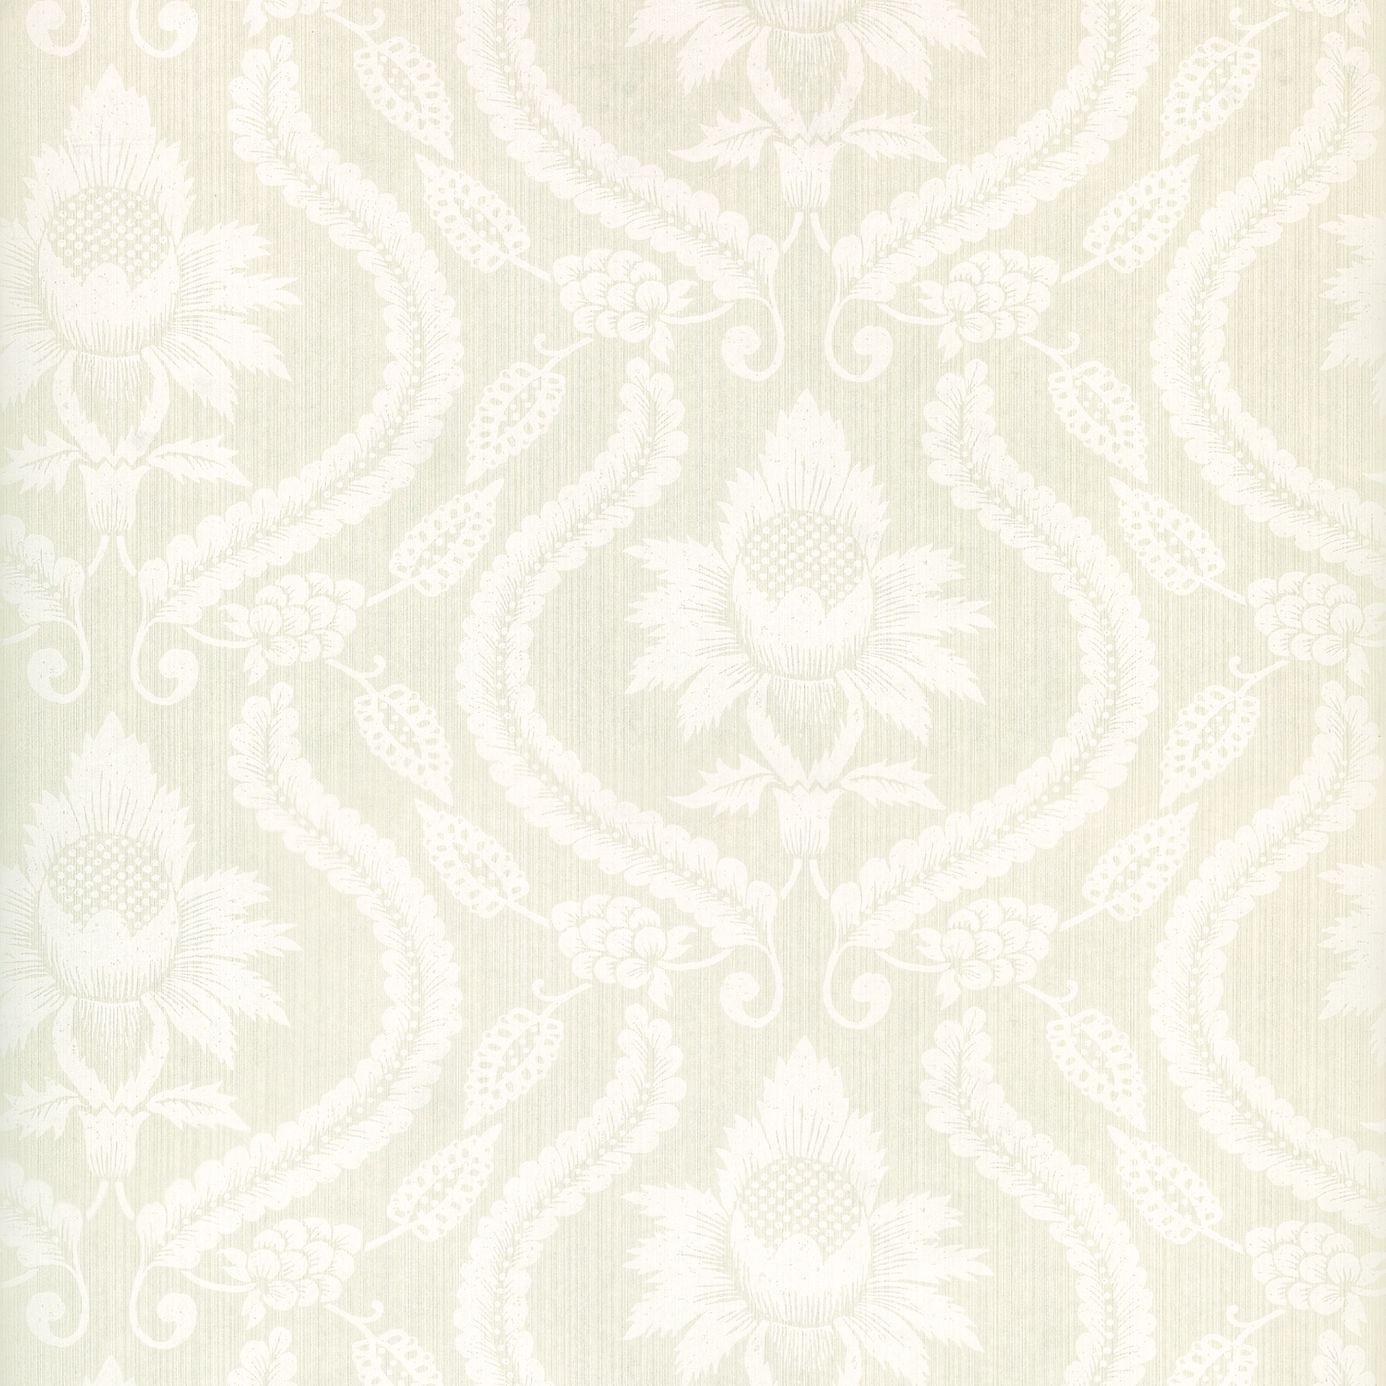 Wallpapers Harlequin Lalika Wallpapers Neela Wallpaper   WhitePearl 1386x1386